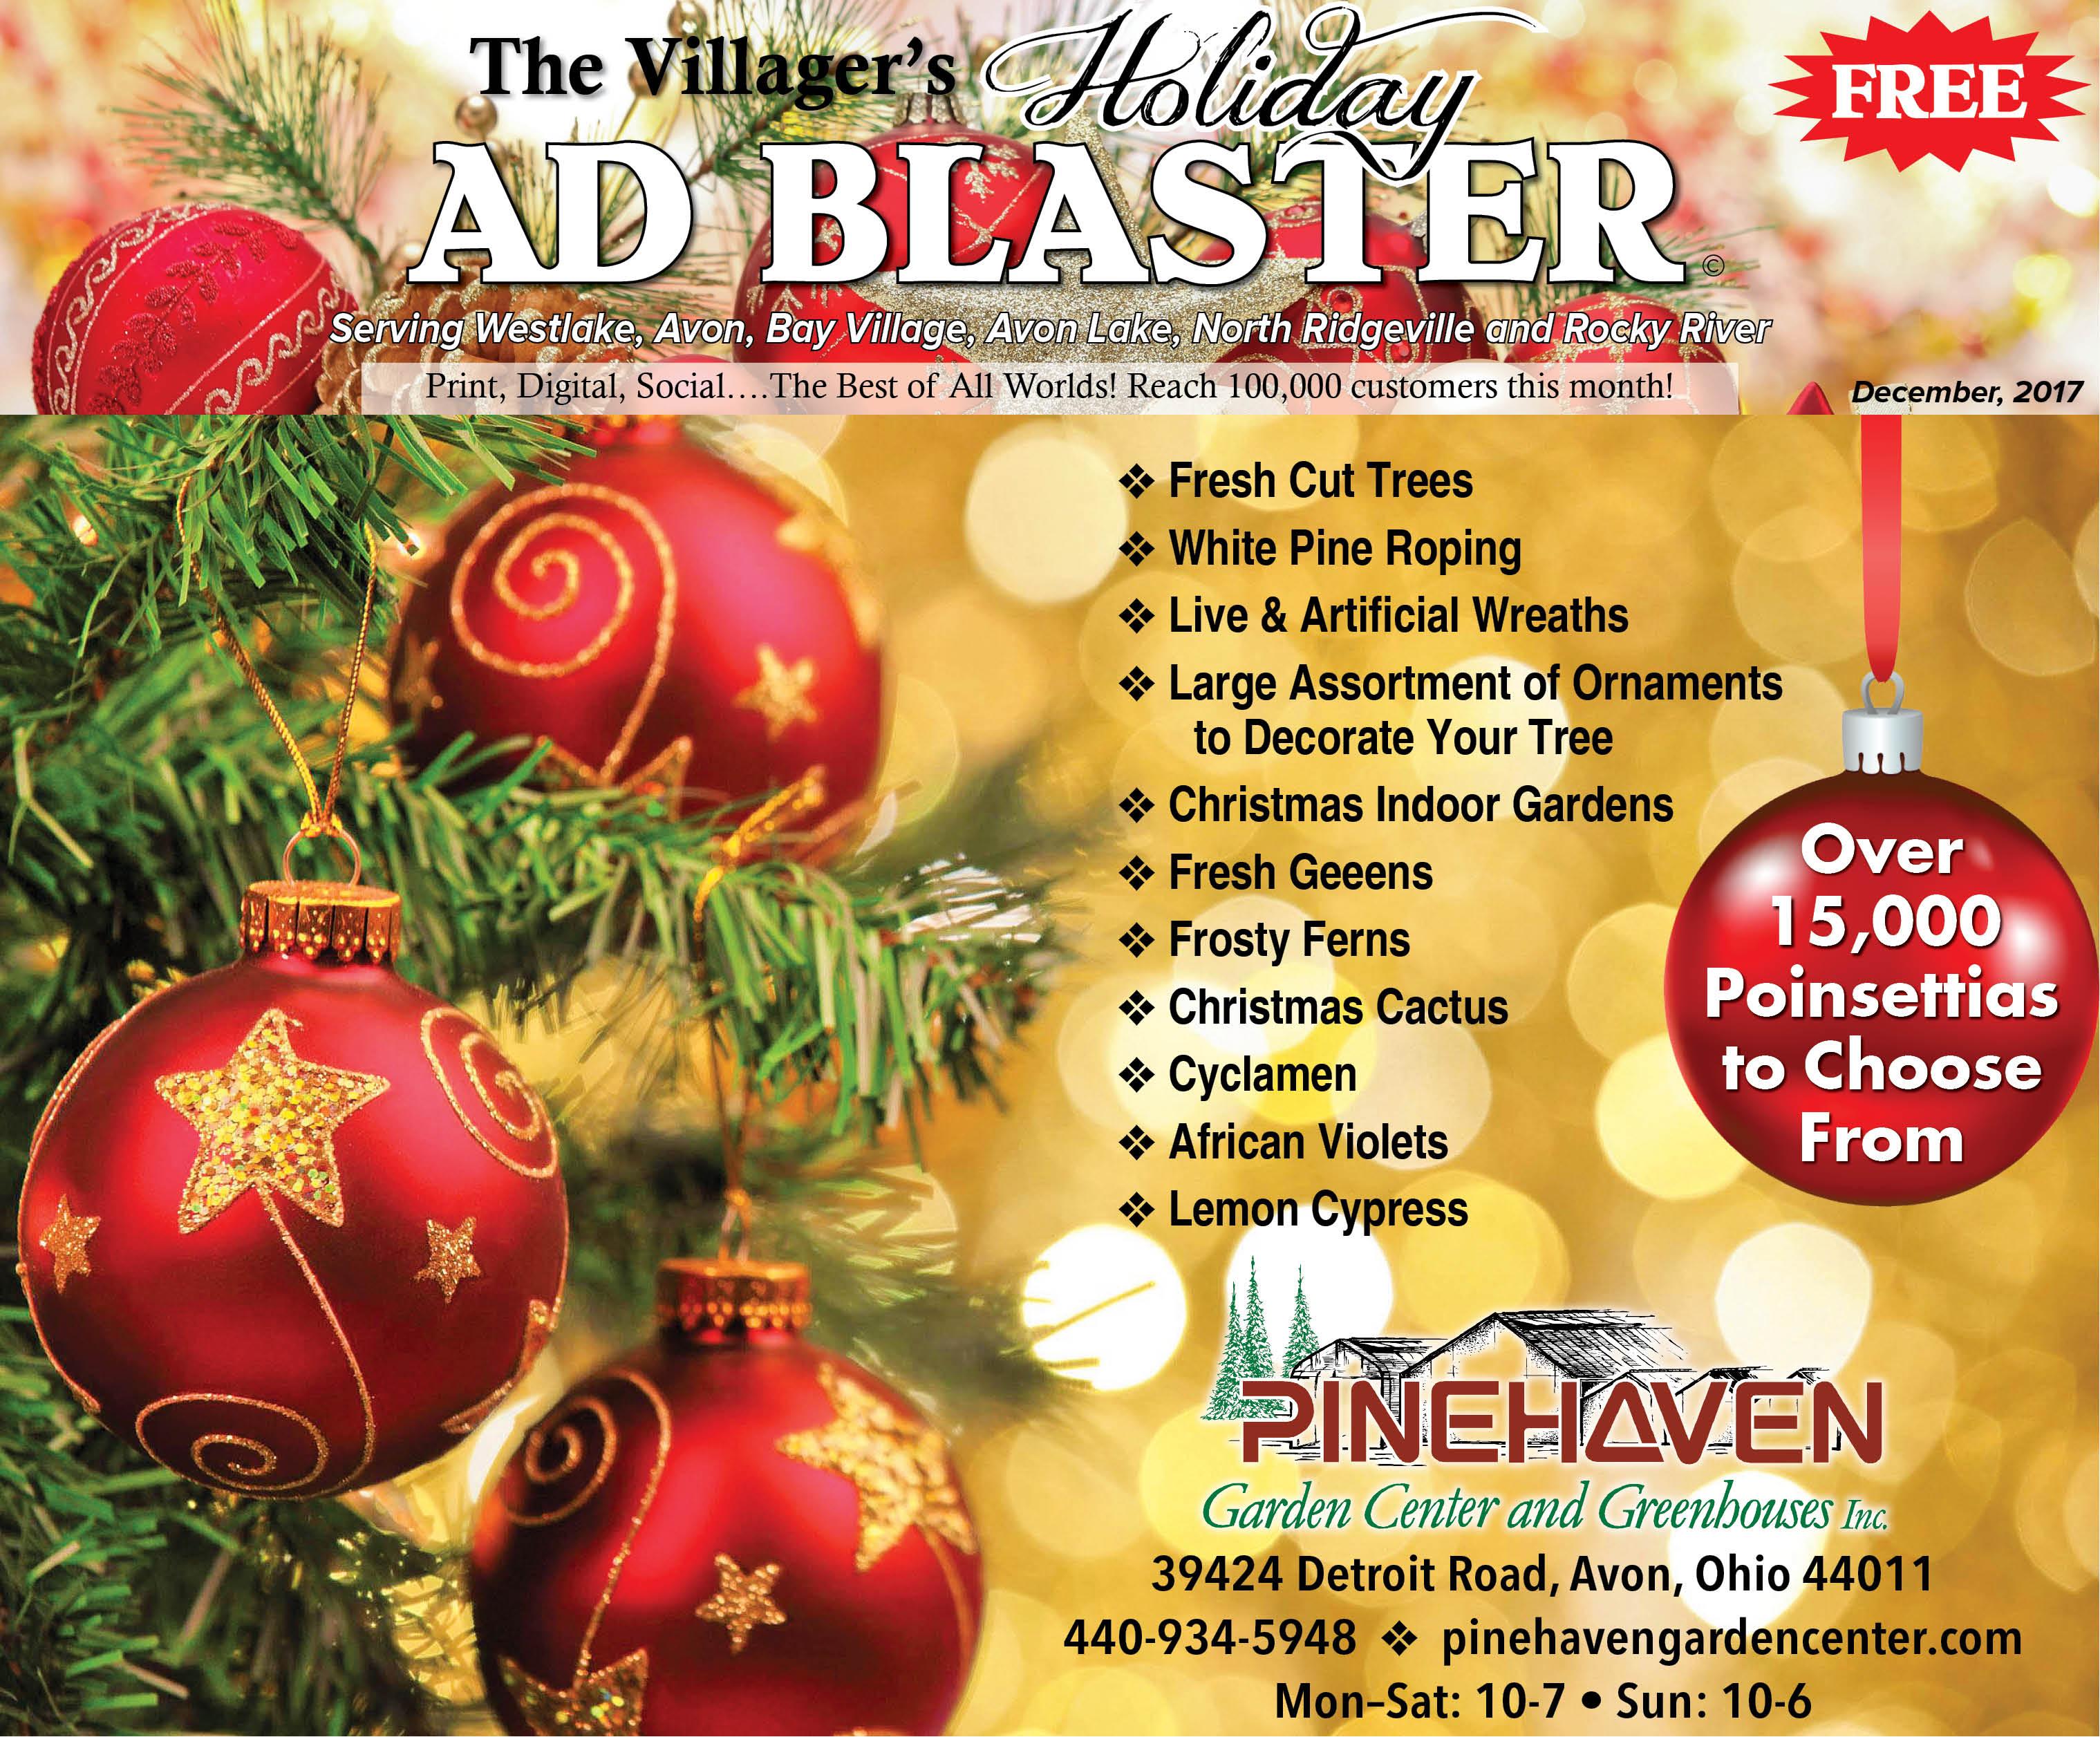 We Believe! Avon Celebrates Christmas | The Villager Newspaper Online